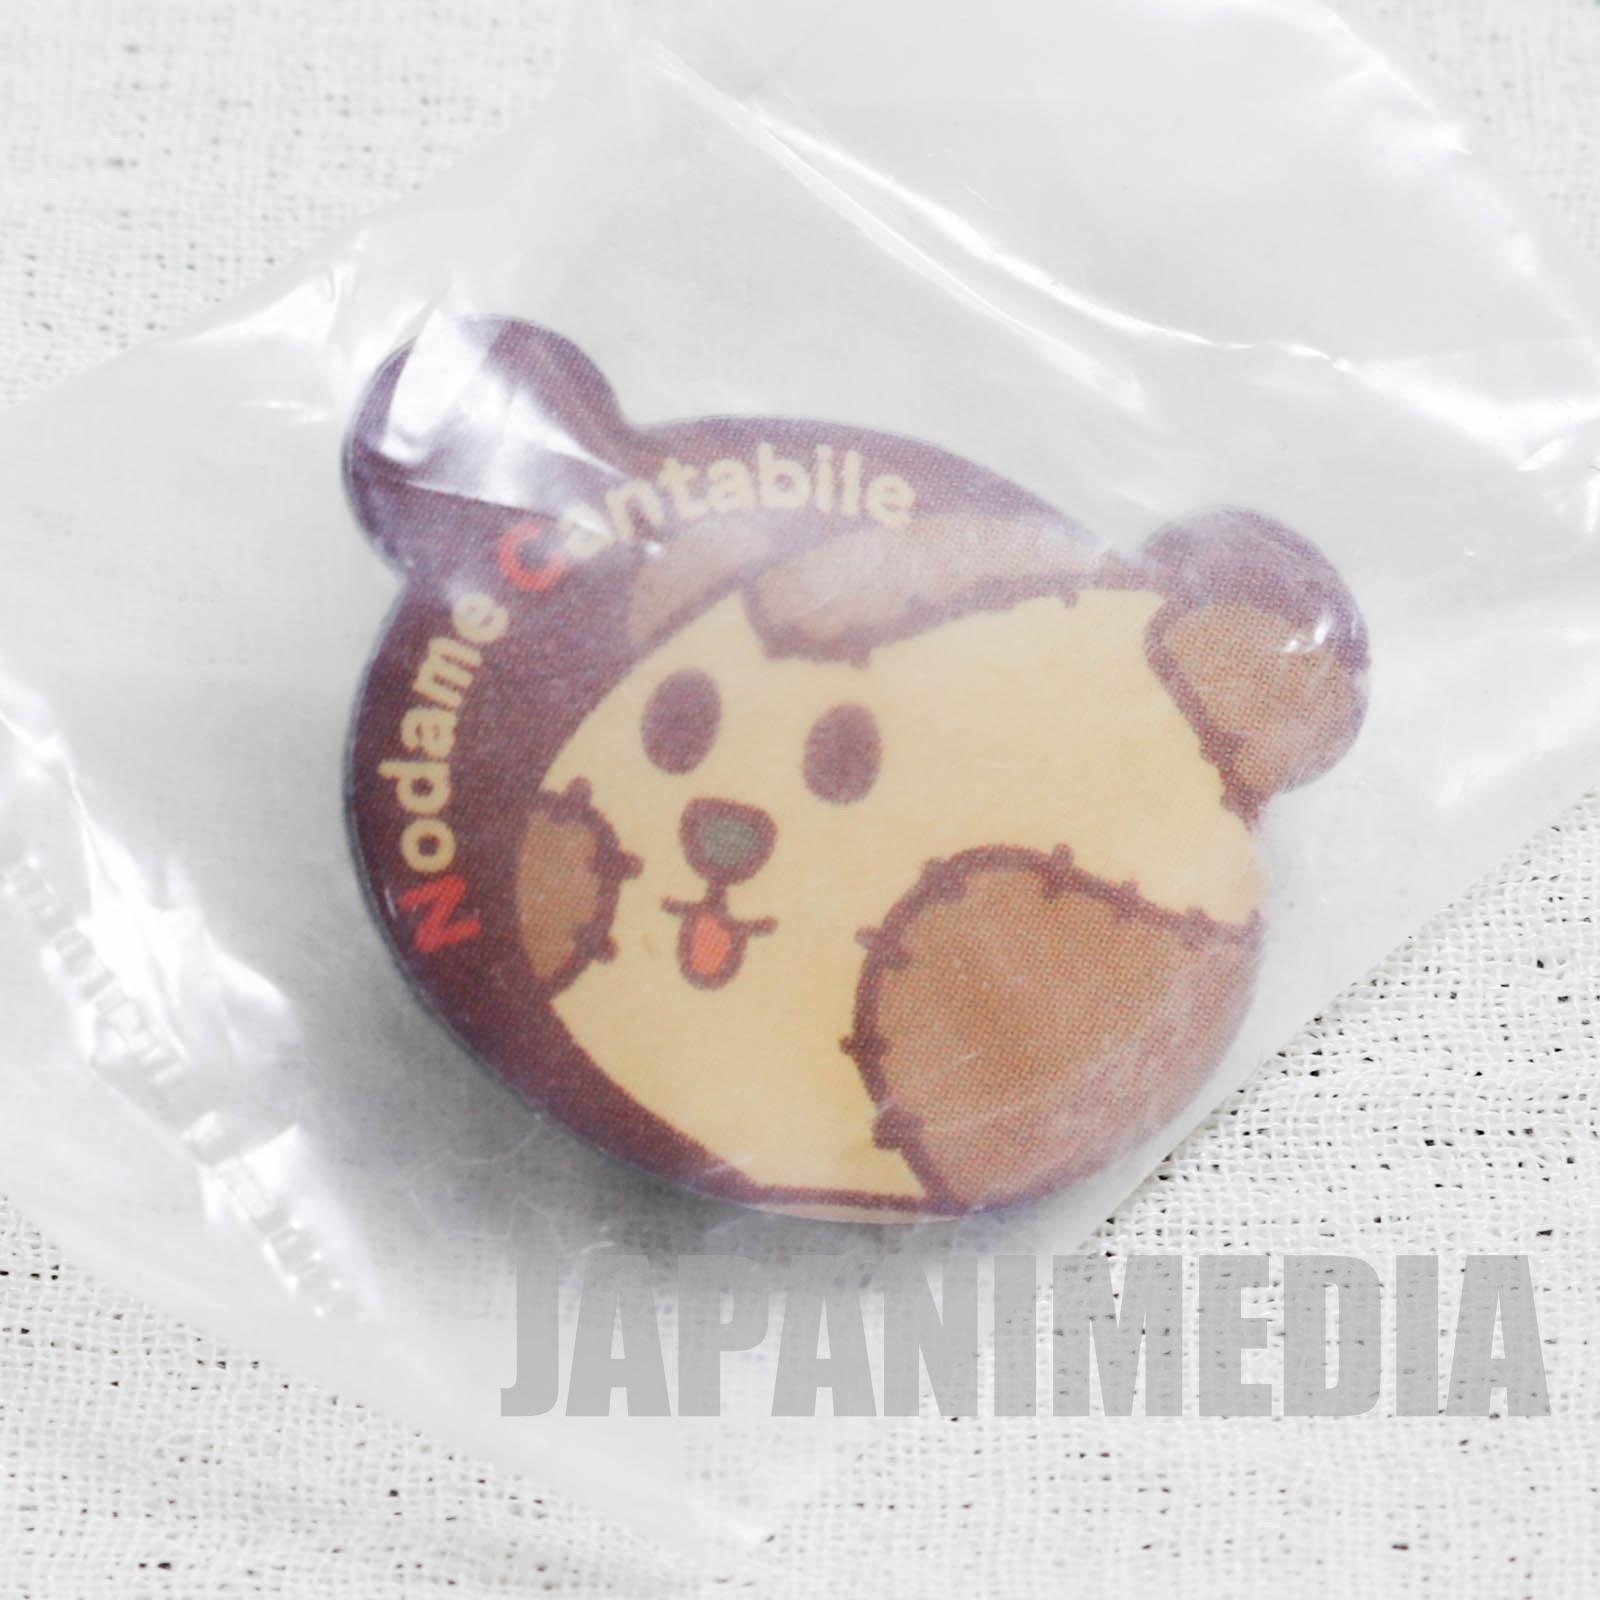 Nodame Cantabile Mongoose Gashapon Pins Collection JAPAN ANIME